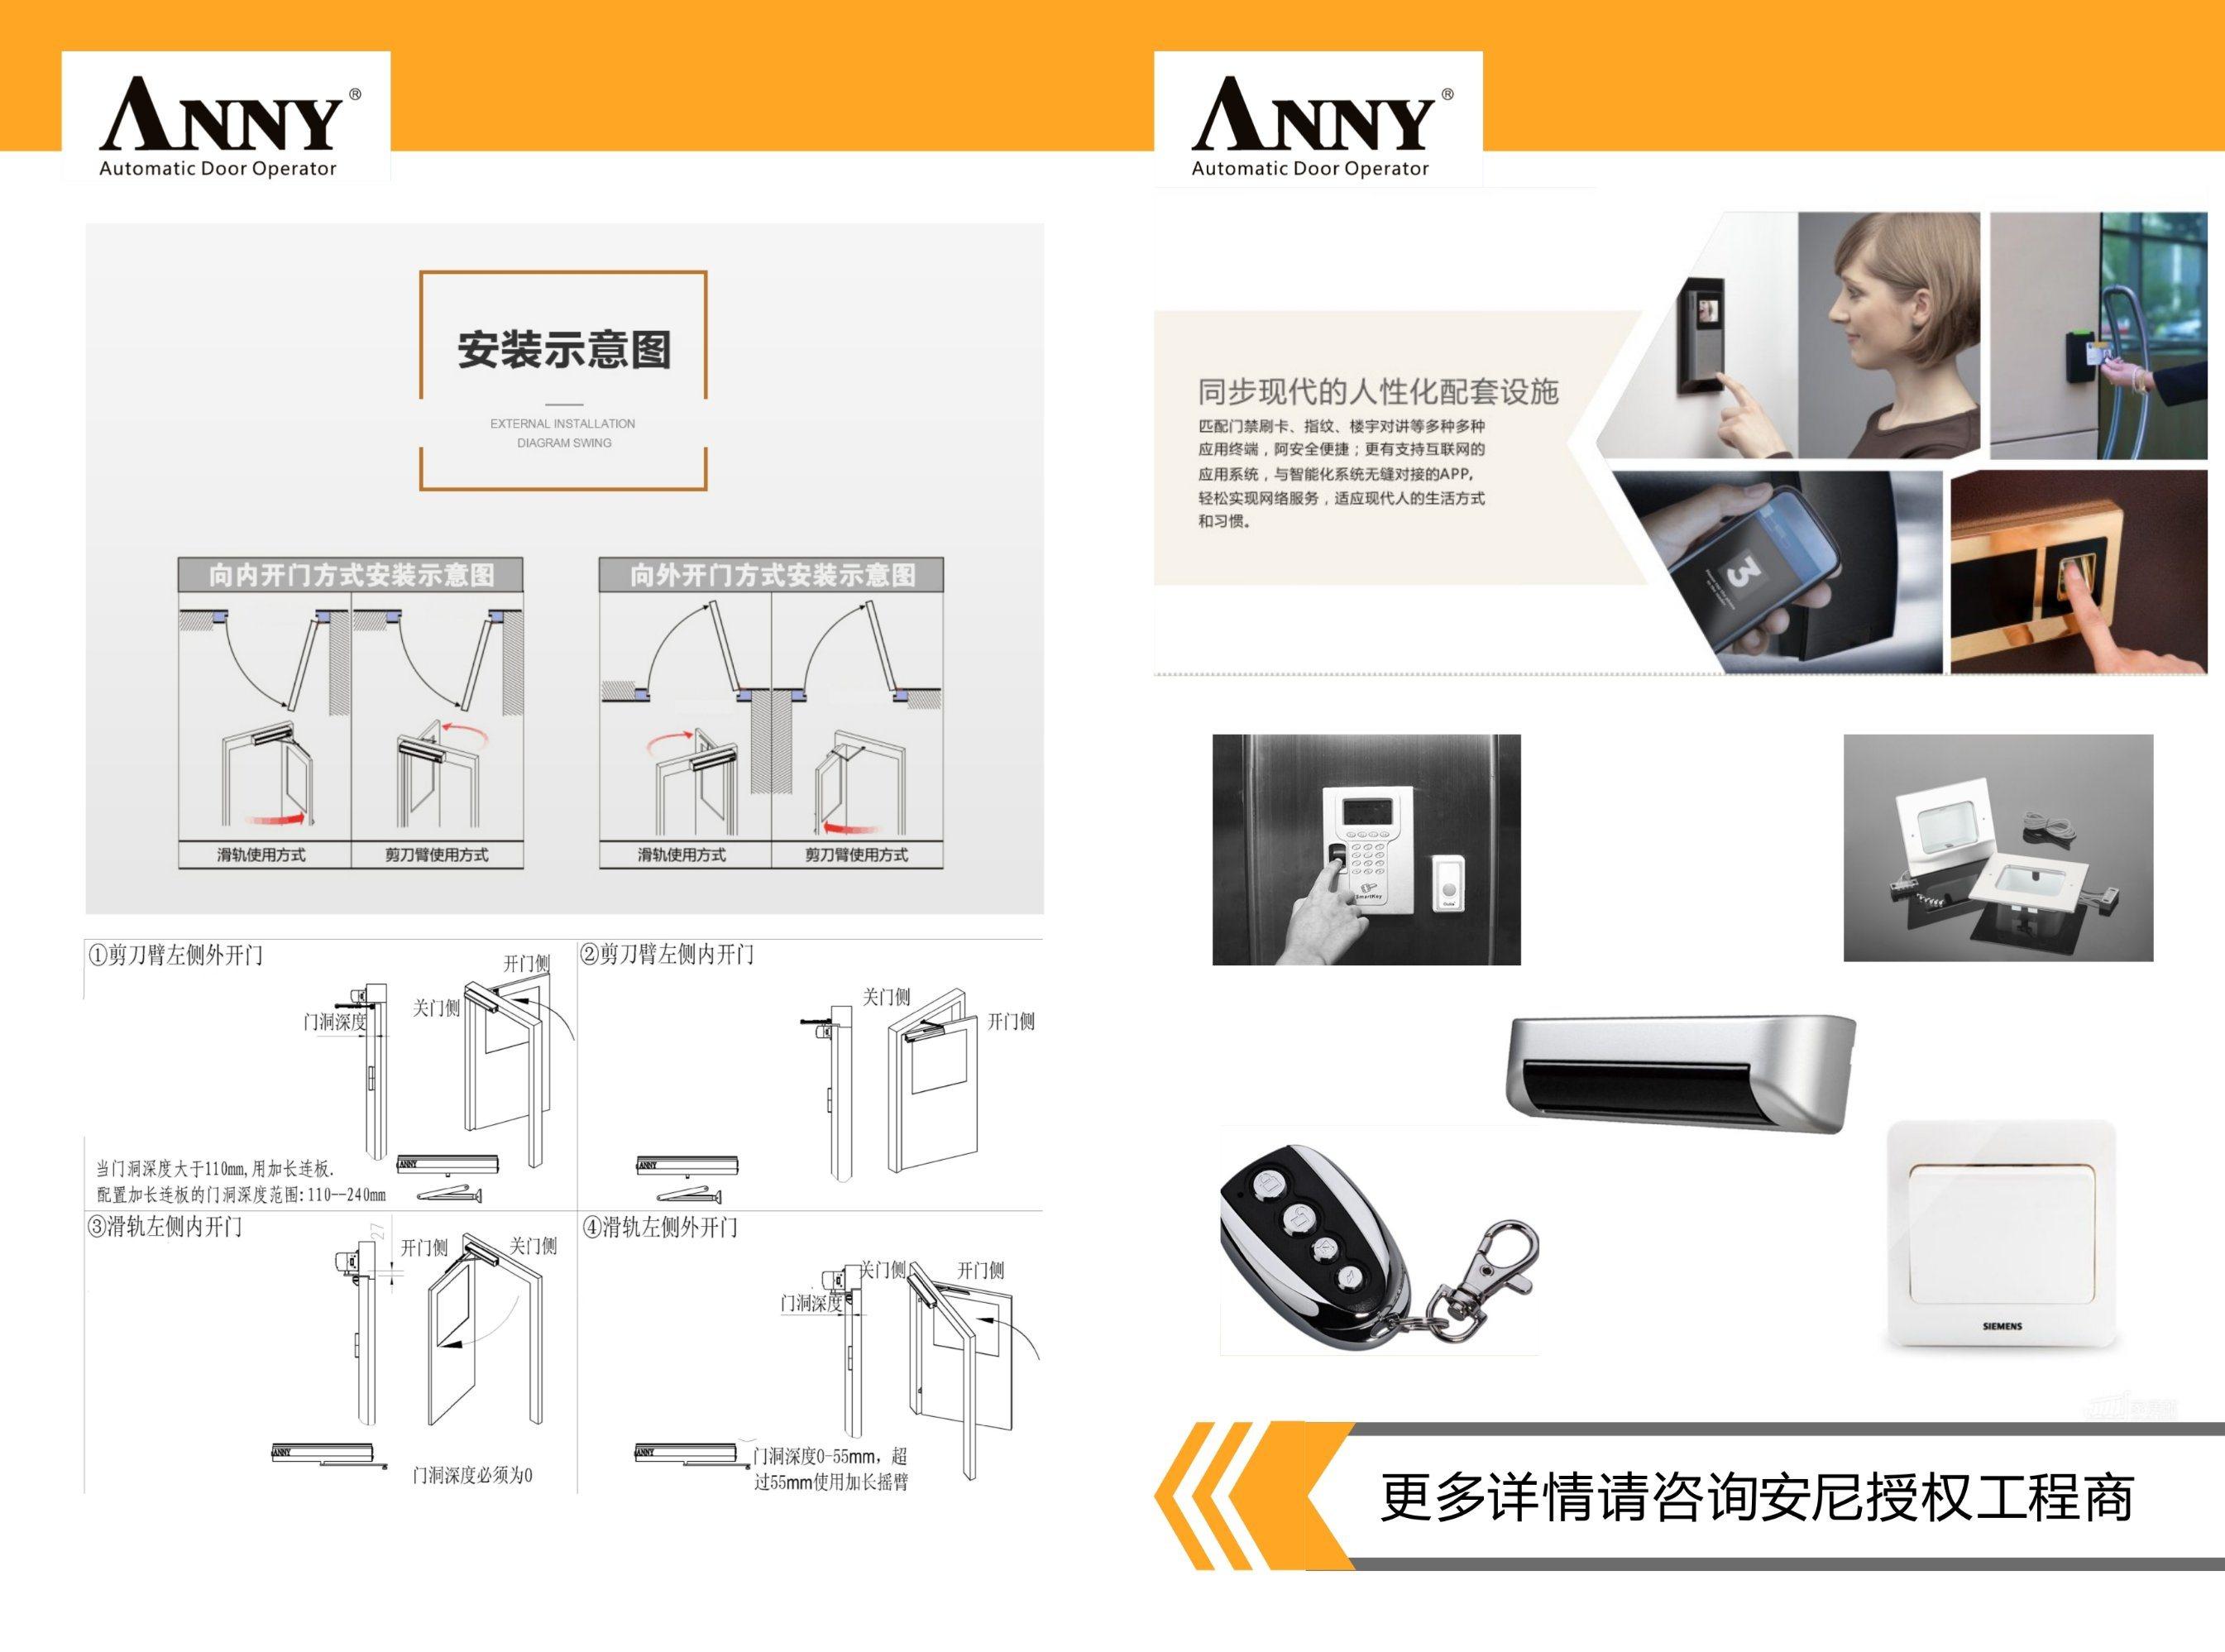 Automatic Swing Door Operator Automatic Door Opener, No Fear Push, Anti-Pressrue, (ANNY1207)